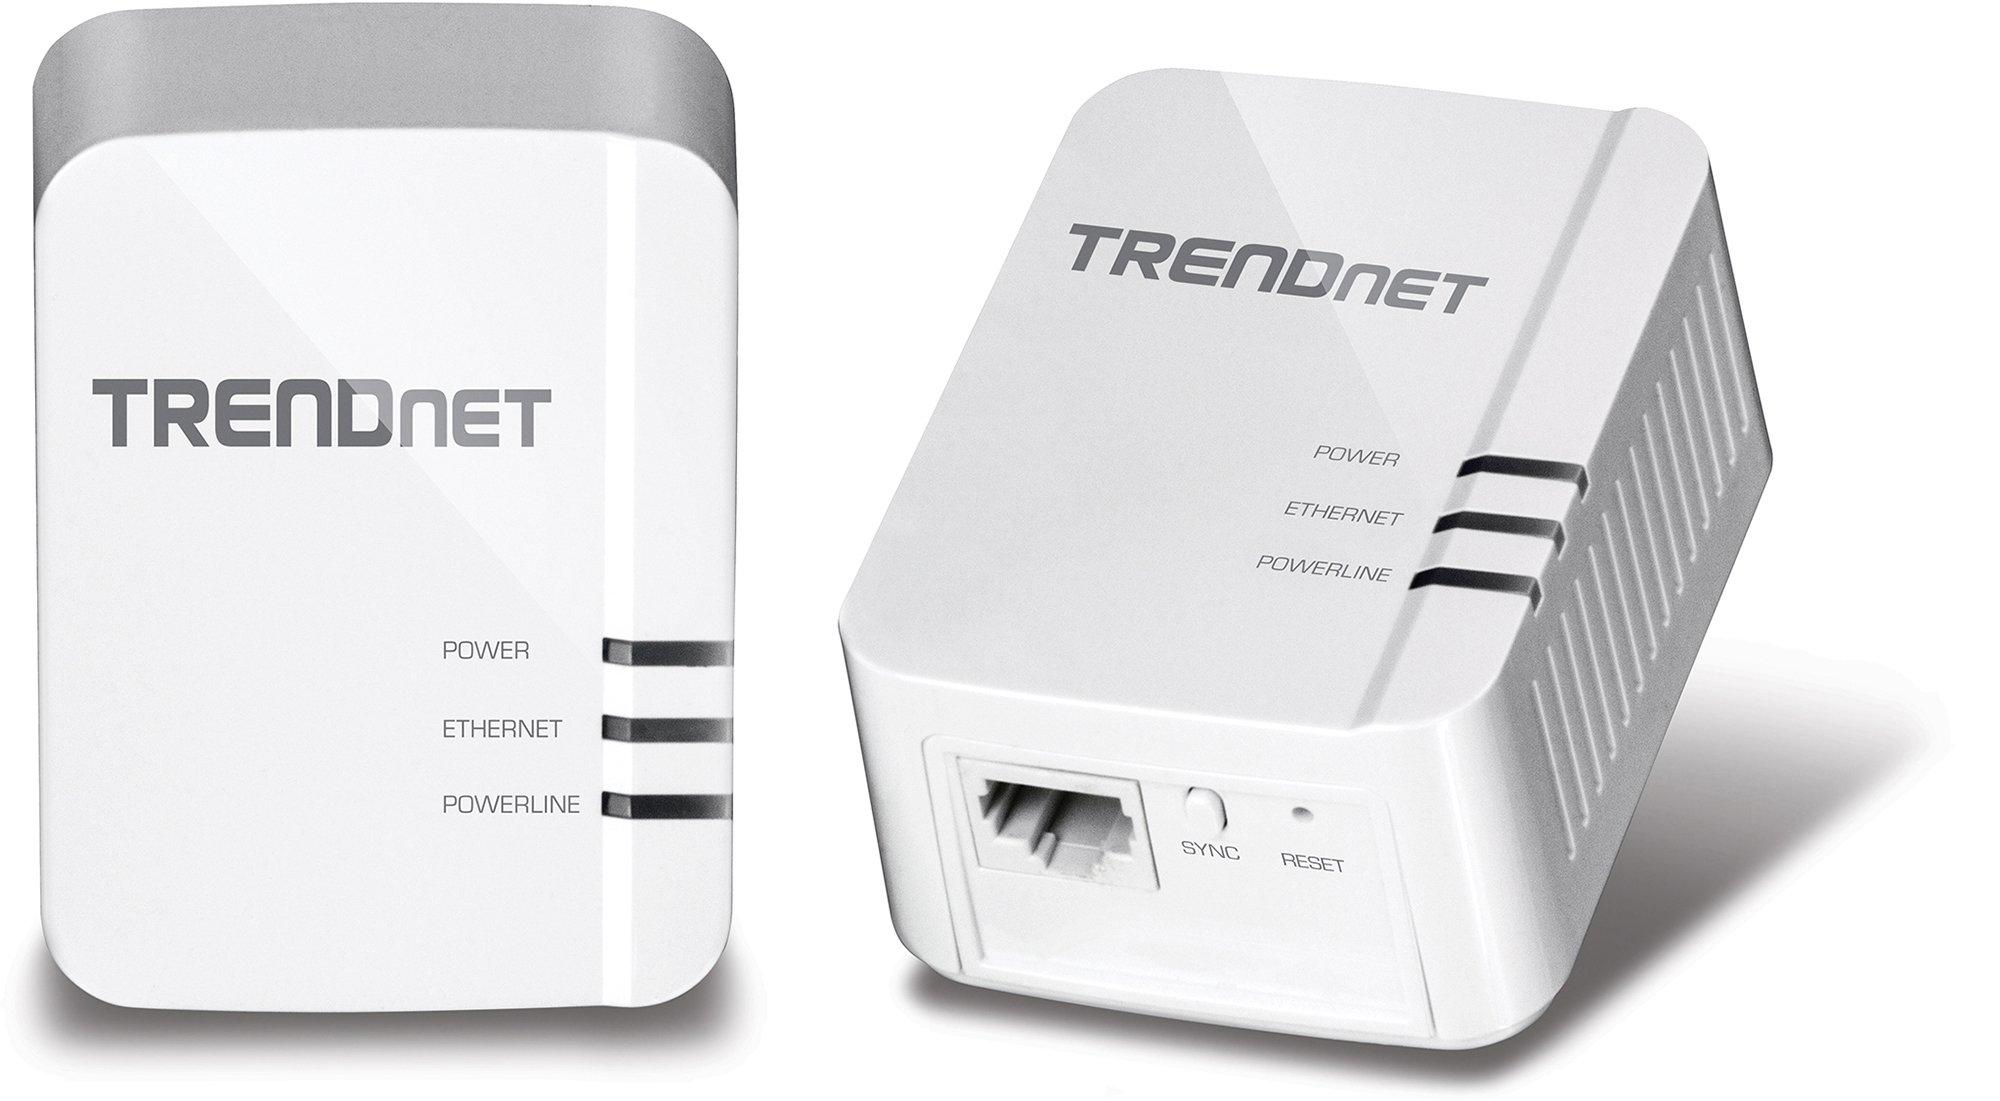 TRENDnet Power Line 1200 AV2 Adapter Starter Kit, 2 Adapters Included with Gigabit Port, Plug and Play, MIMO, Beamforming (TPL-420E2K)